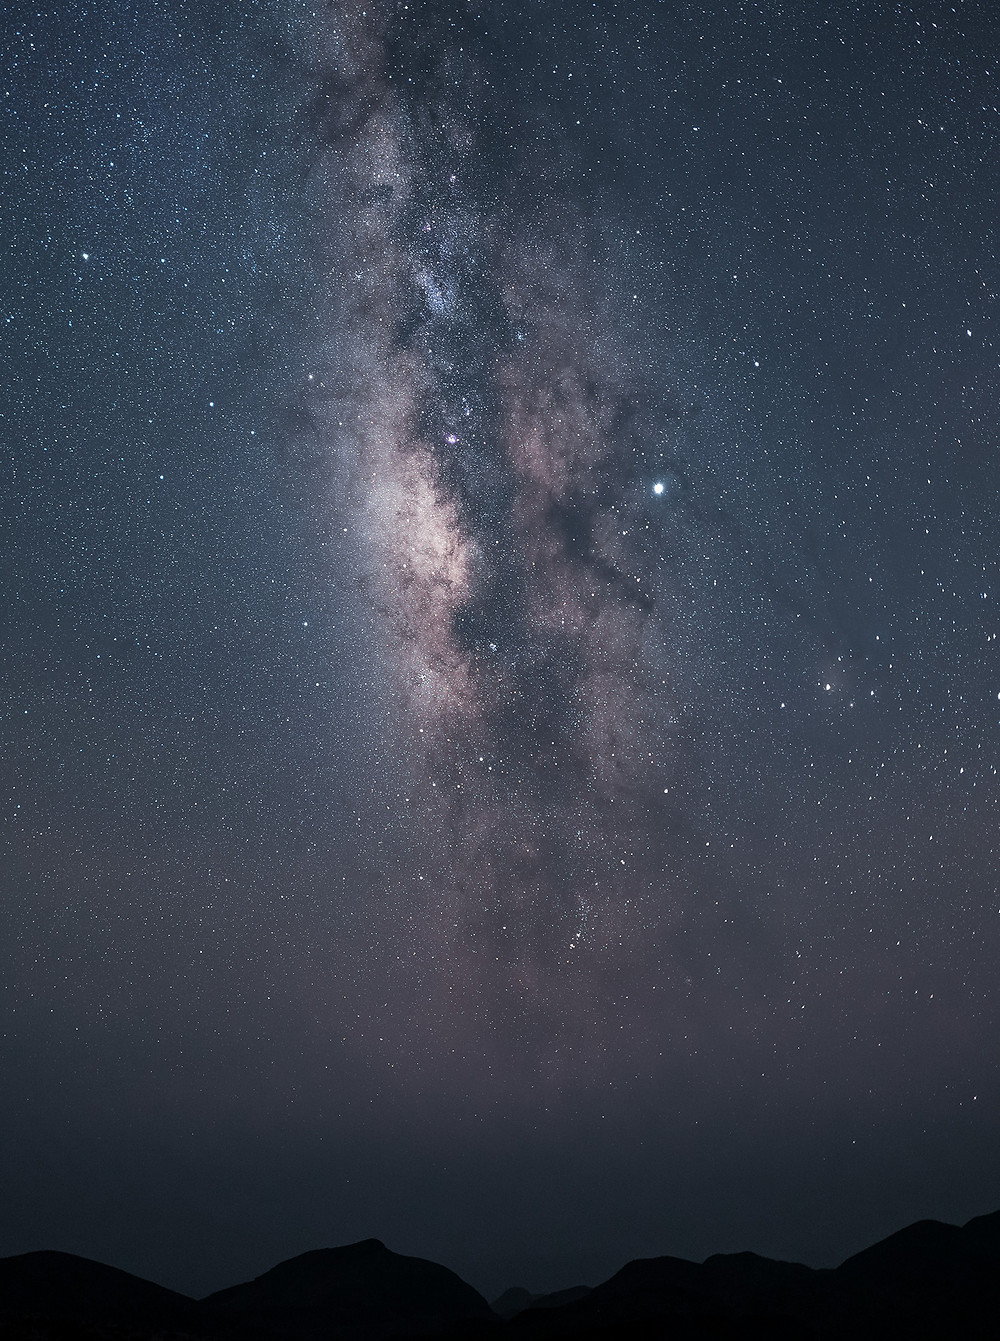 milky way, mountains, space, night sky